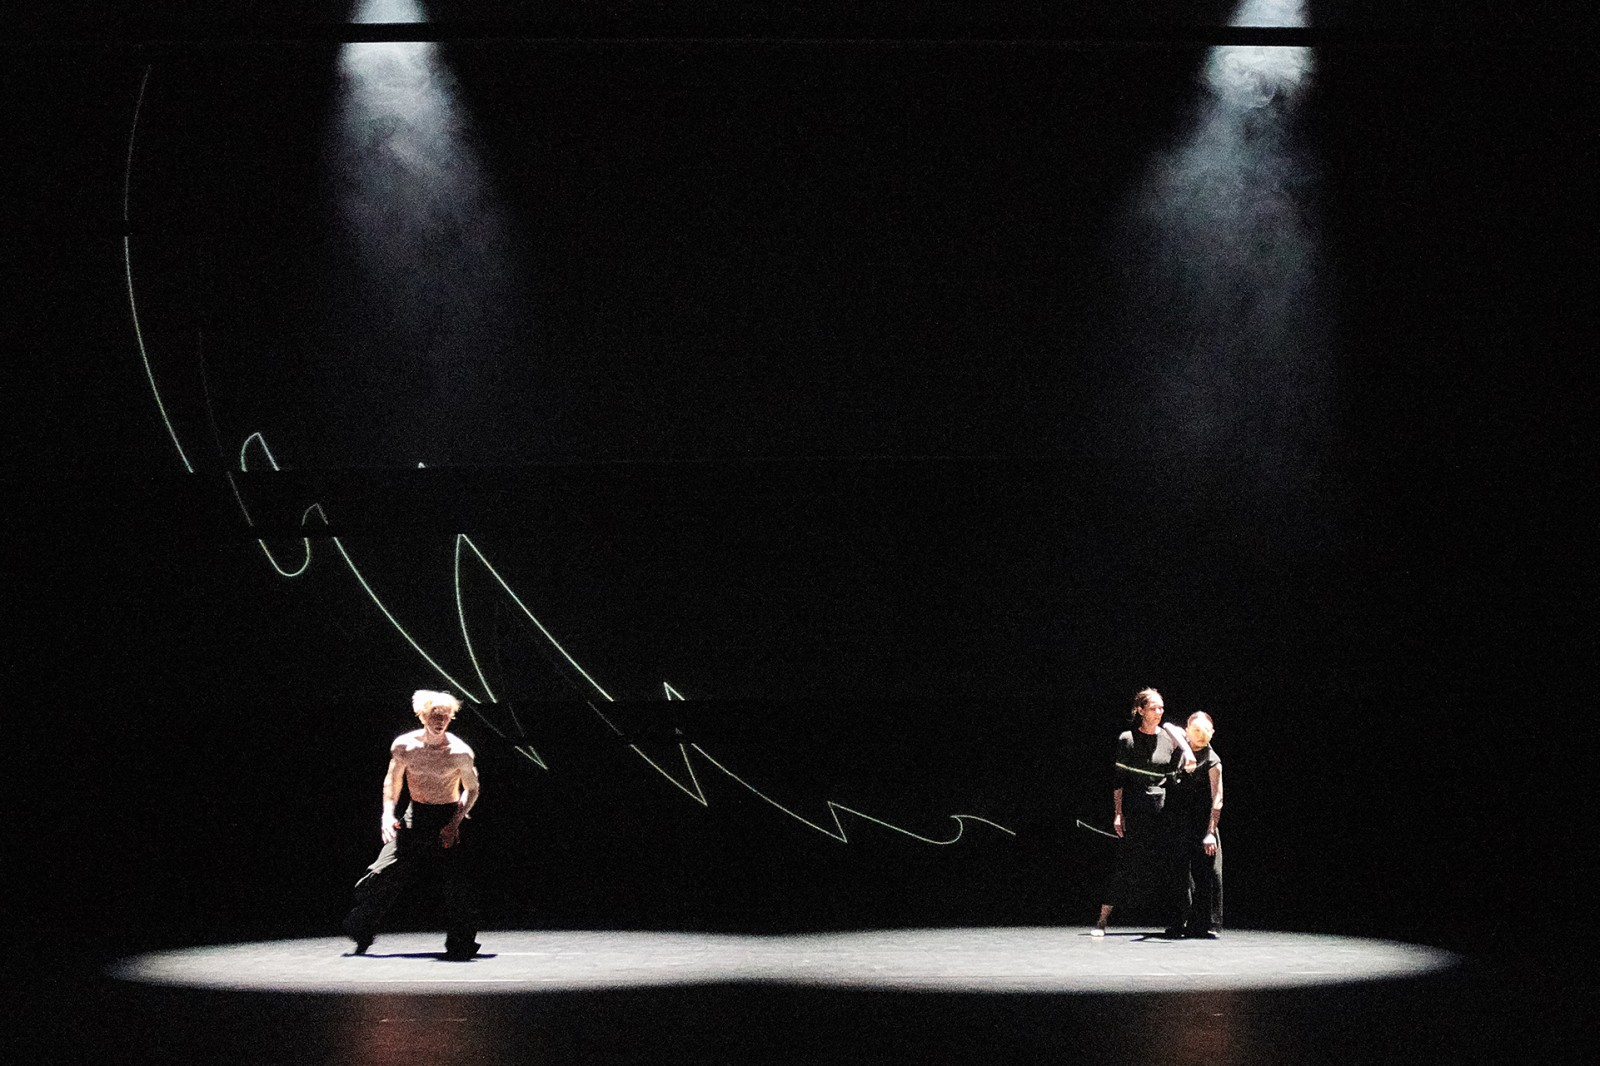 Guido Dutilh, Kotono Choda & Igone de Jongh ©Peter Bilak https://make-move-think.org/